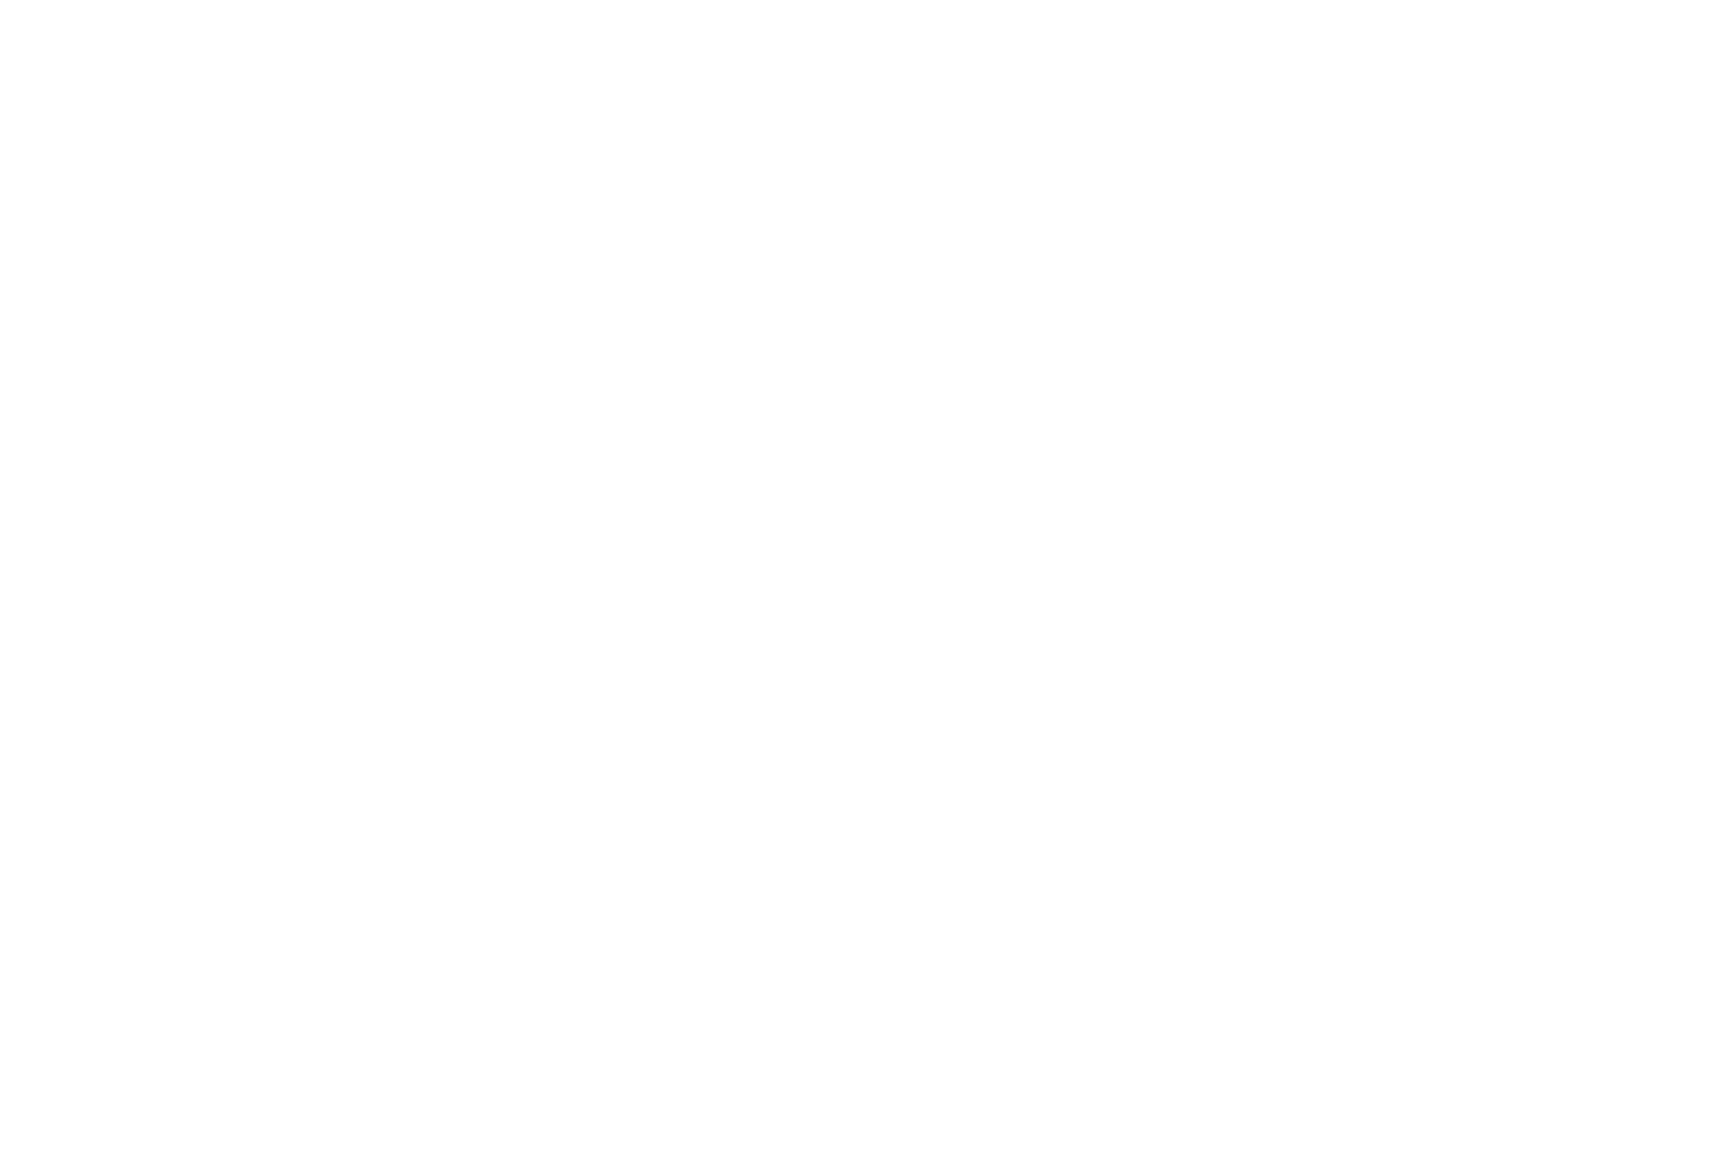 FINALIST - Portland Comedy Film Festival - 2020